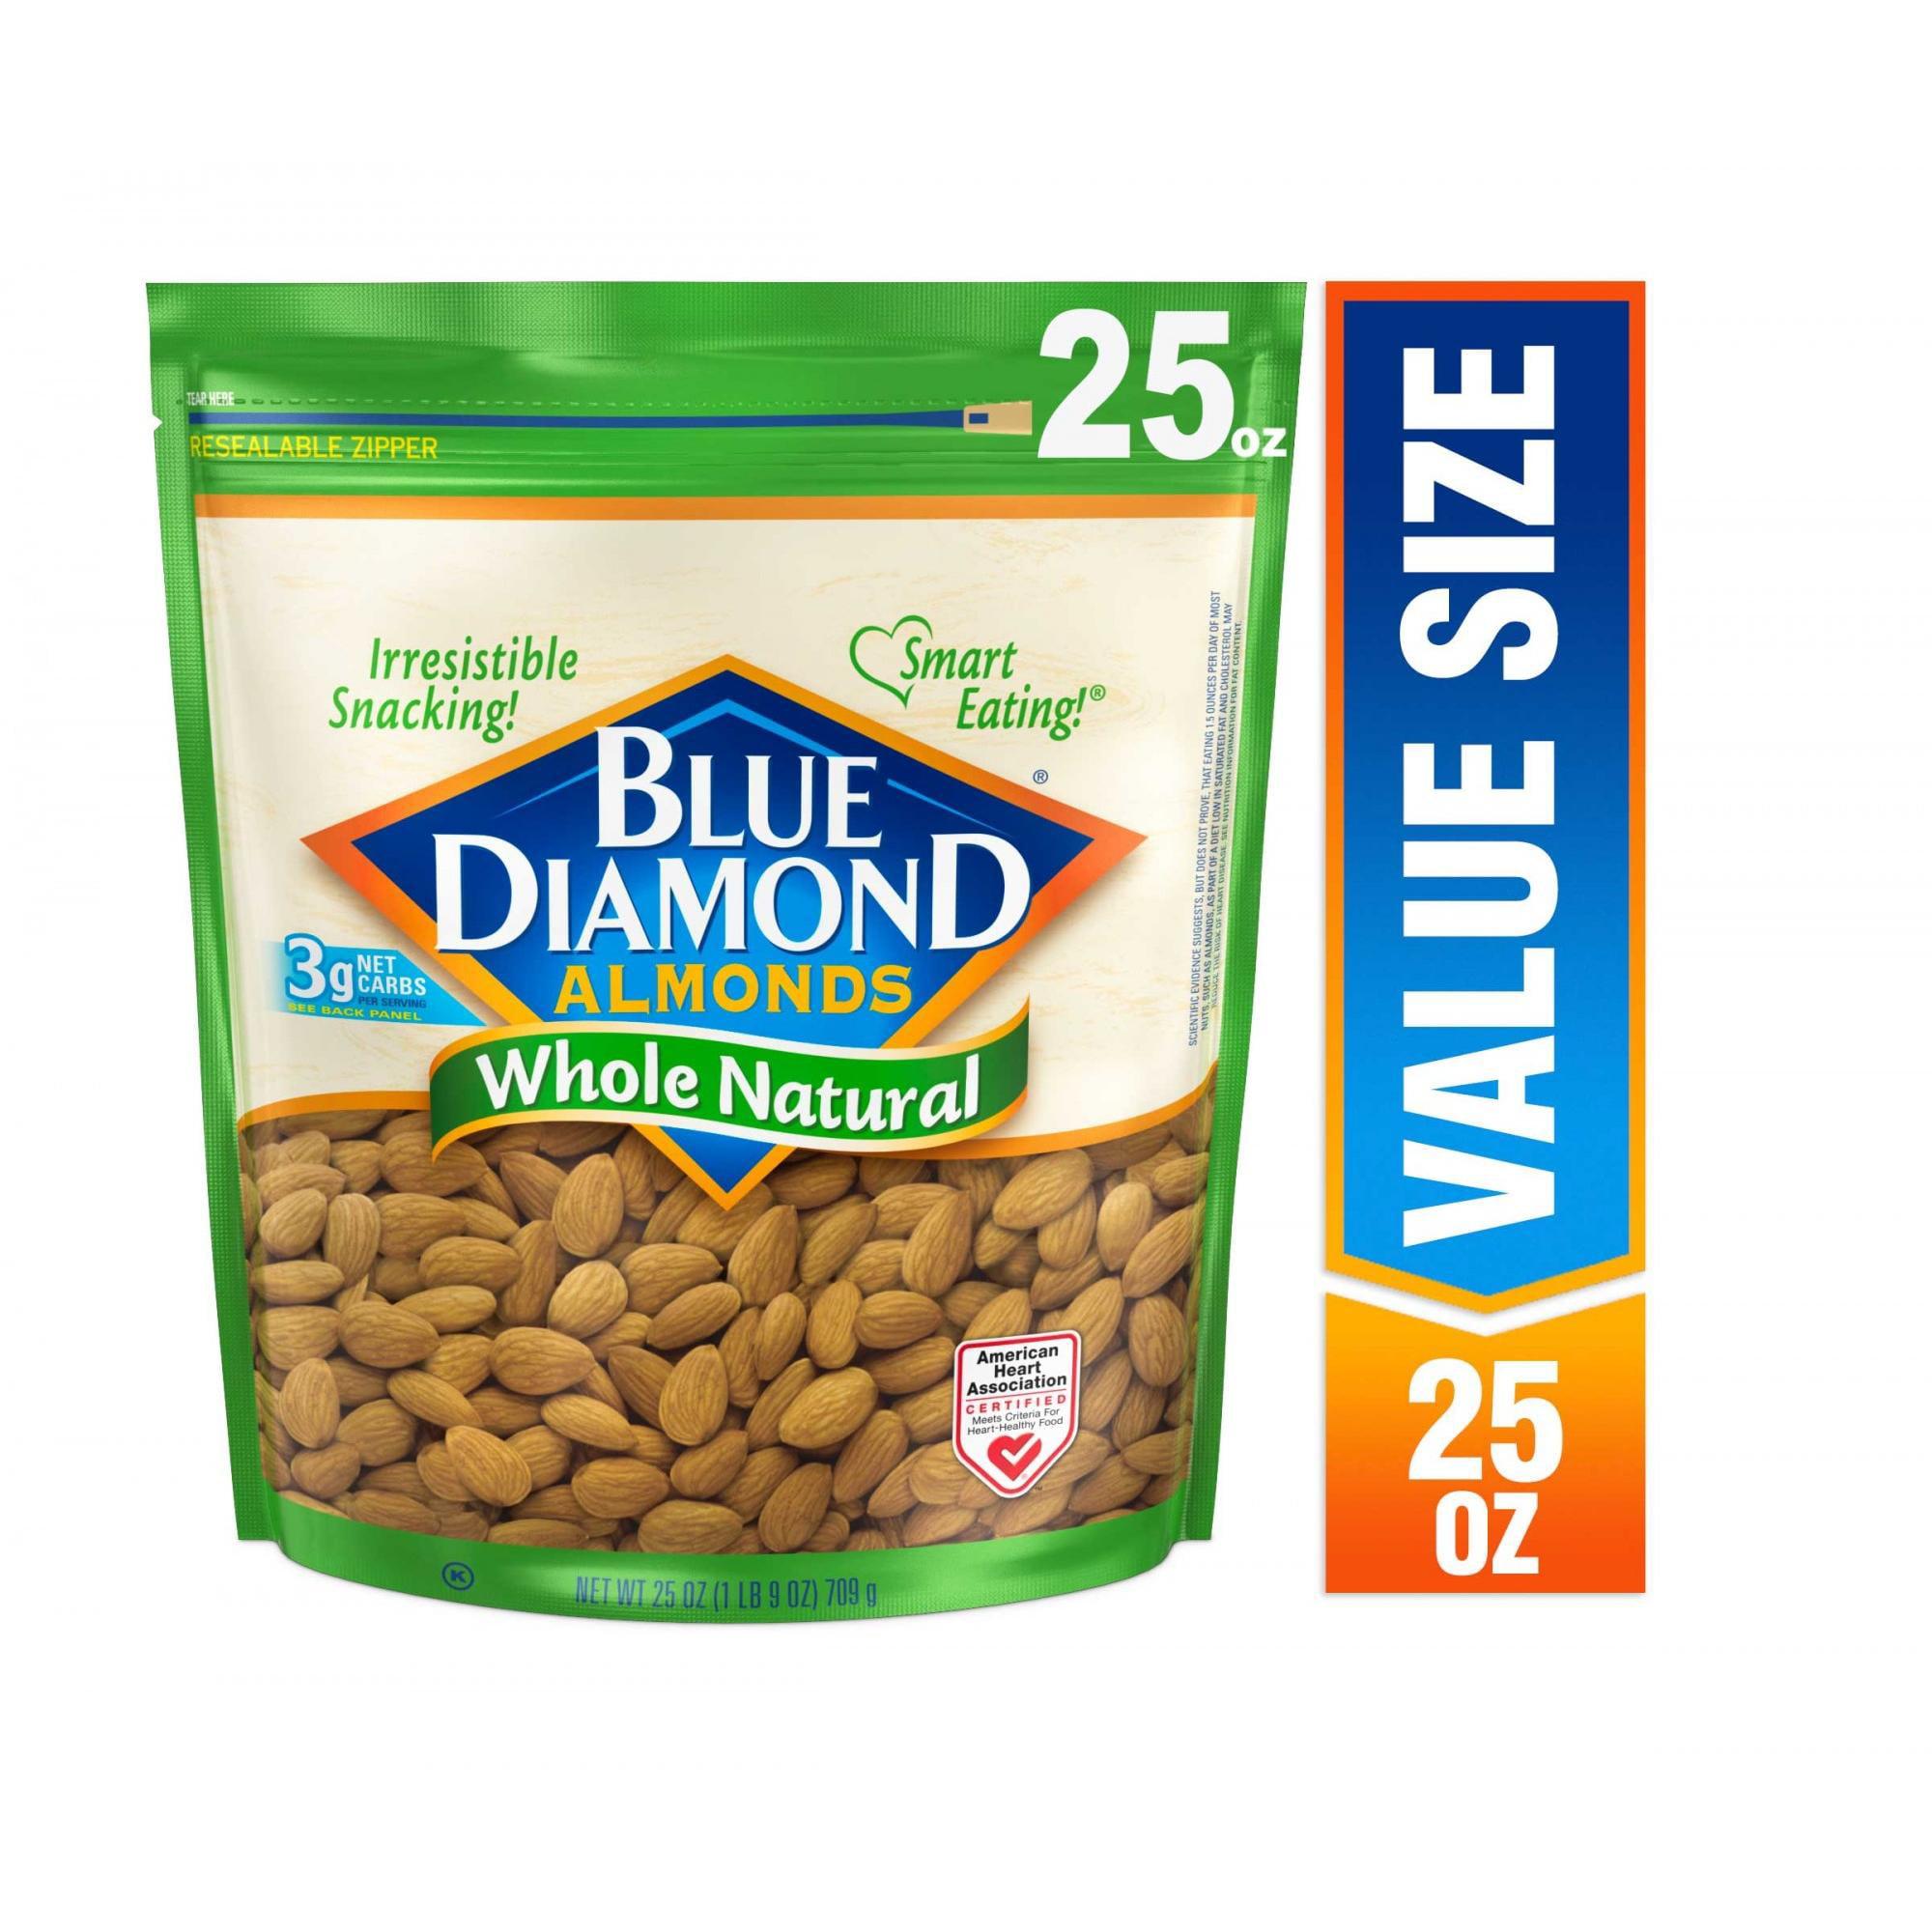 c2b0094880e Blue Diamond Almonds